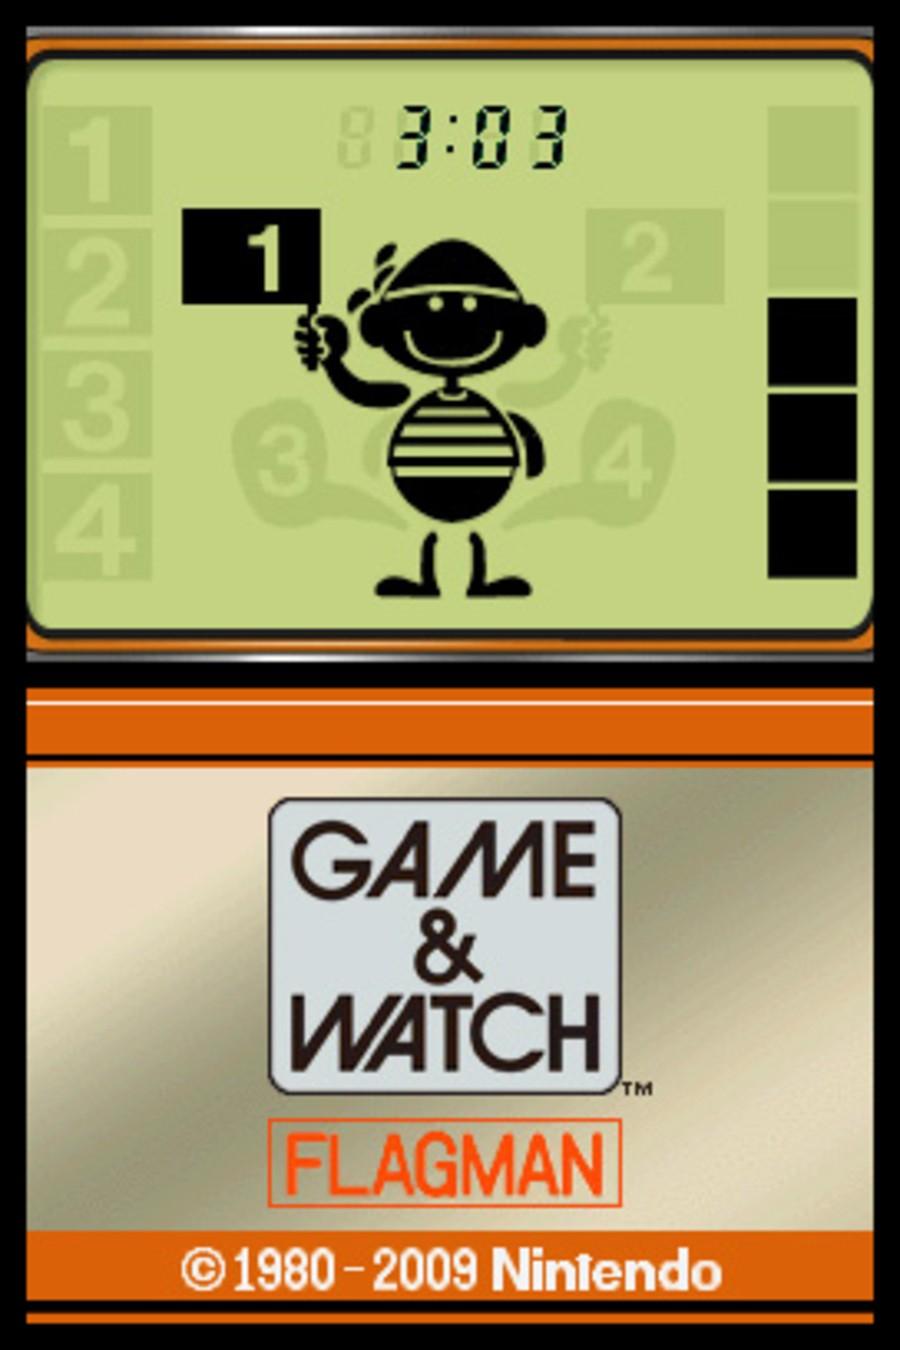 Game & Watch Flagman Screenshot